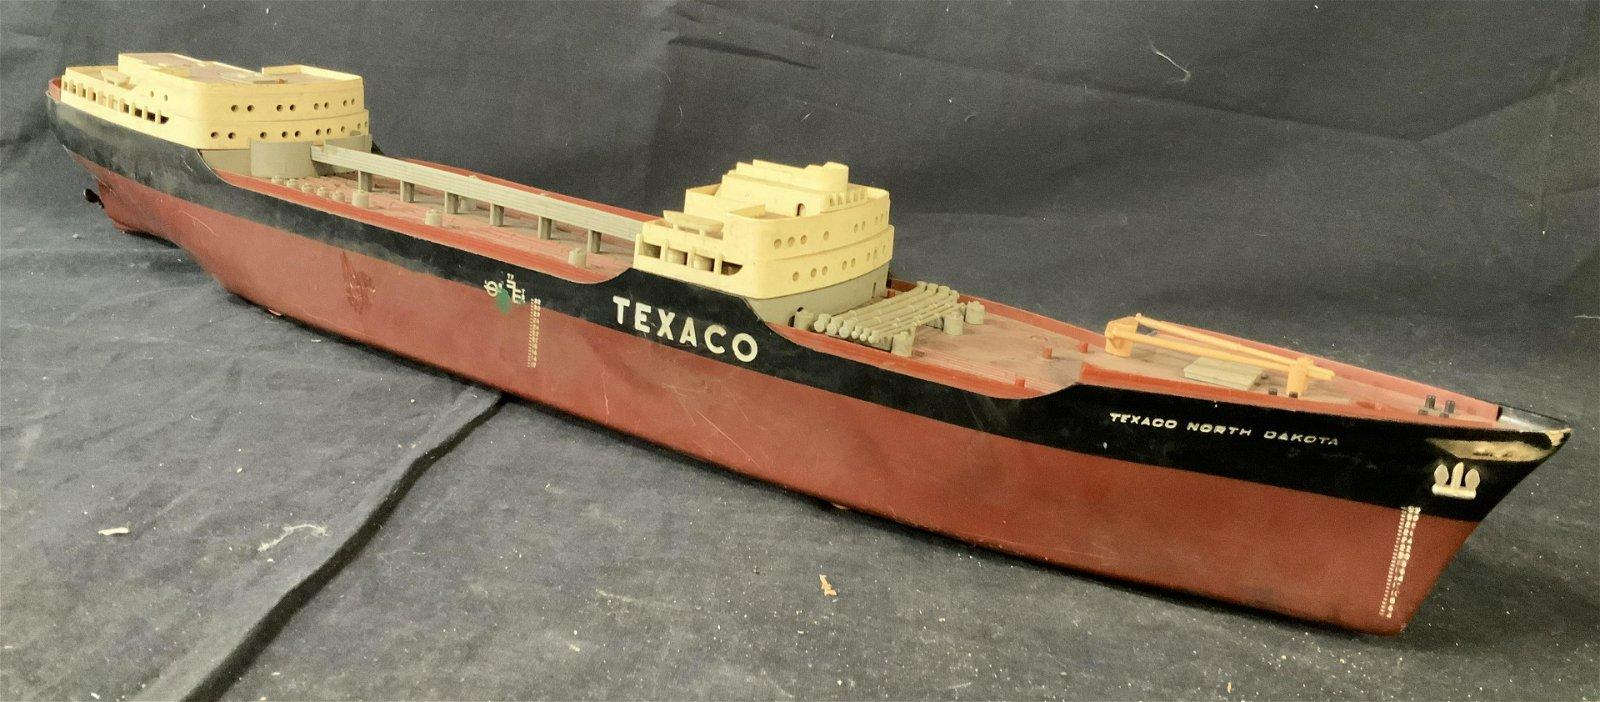 Vintage TEXACO Oil Barrel Ship Replica